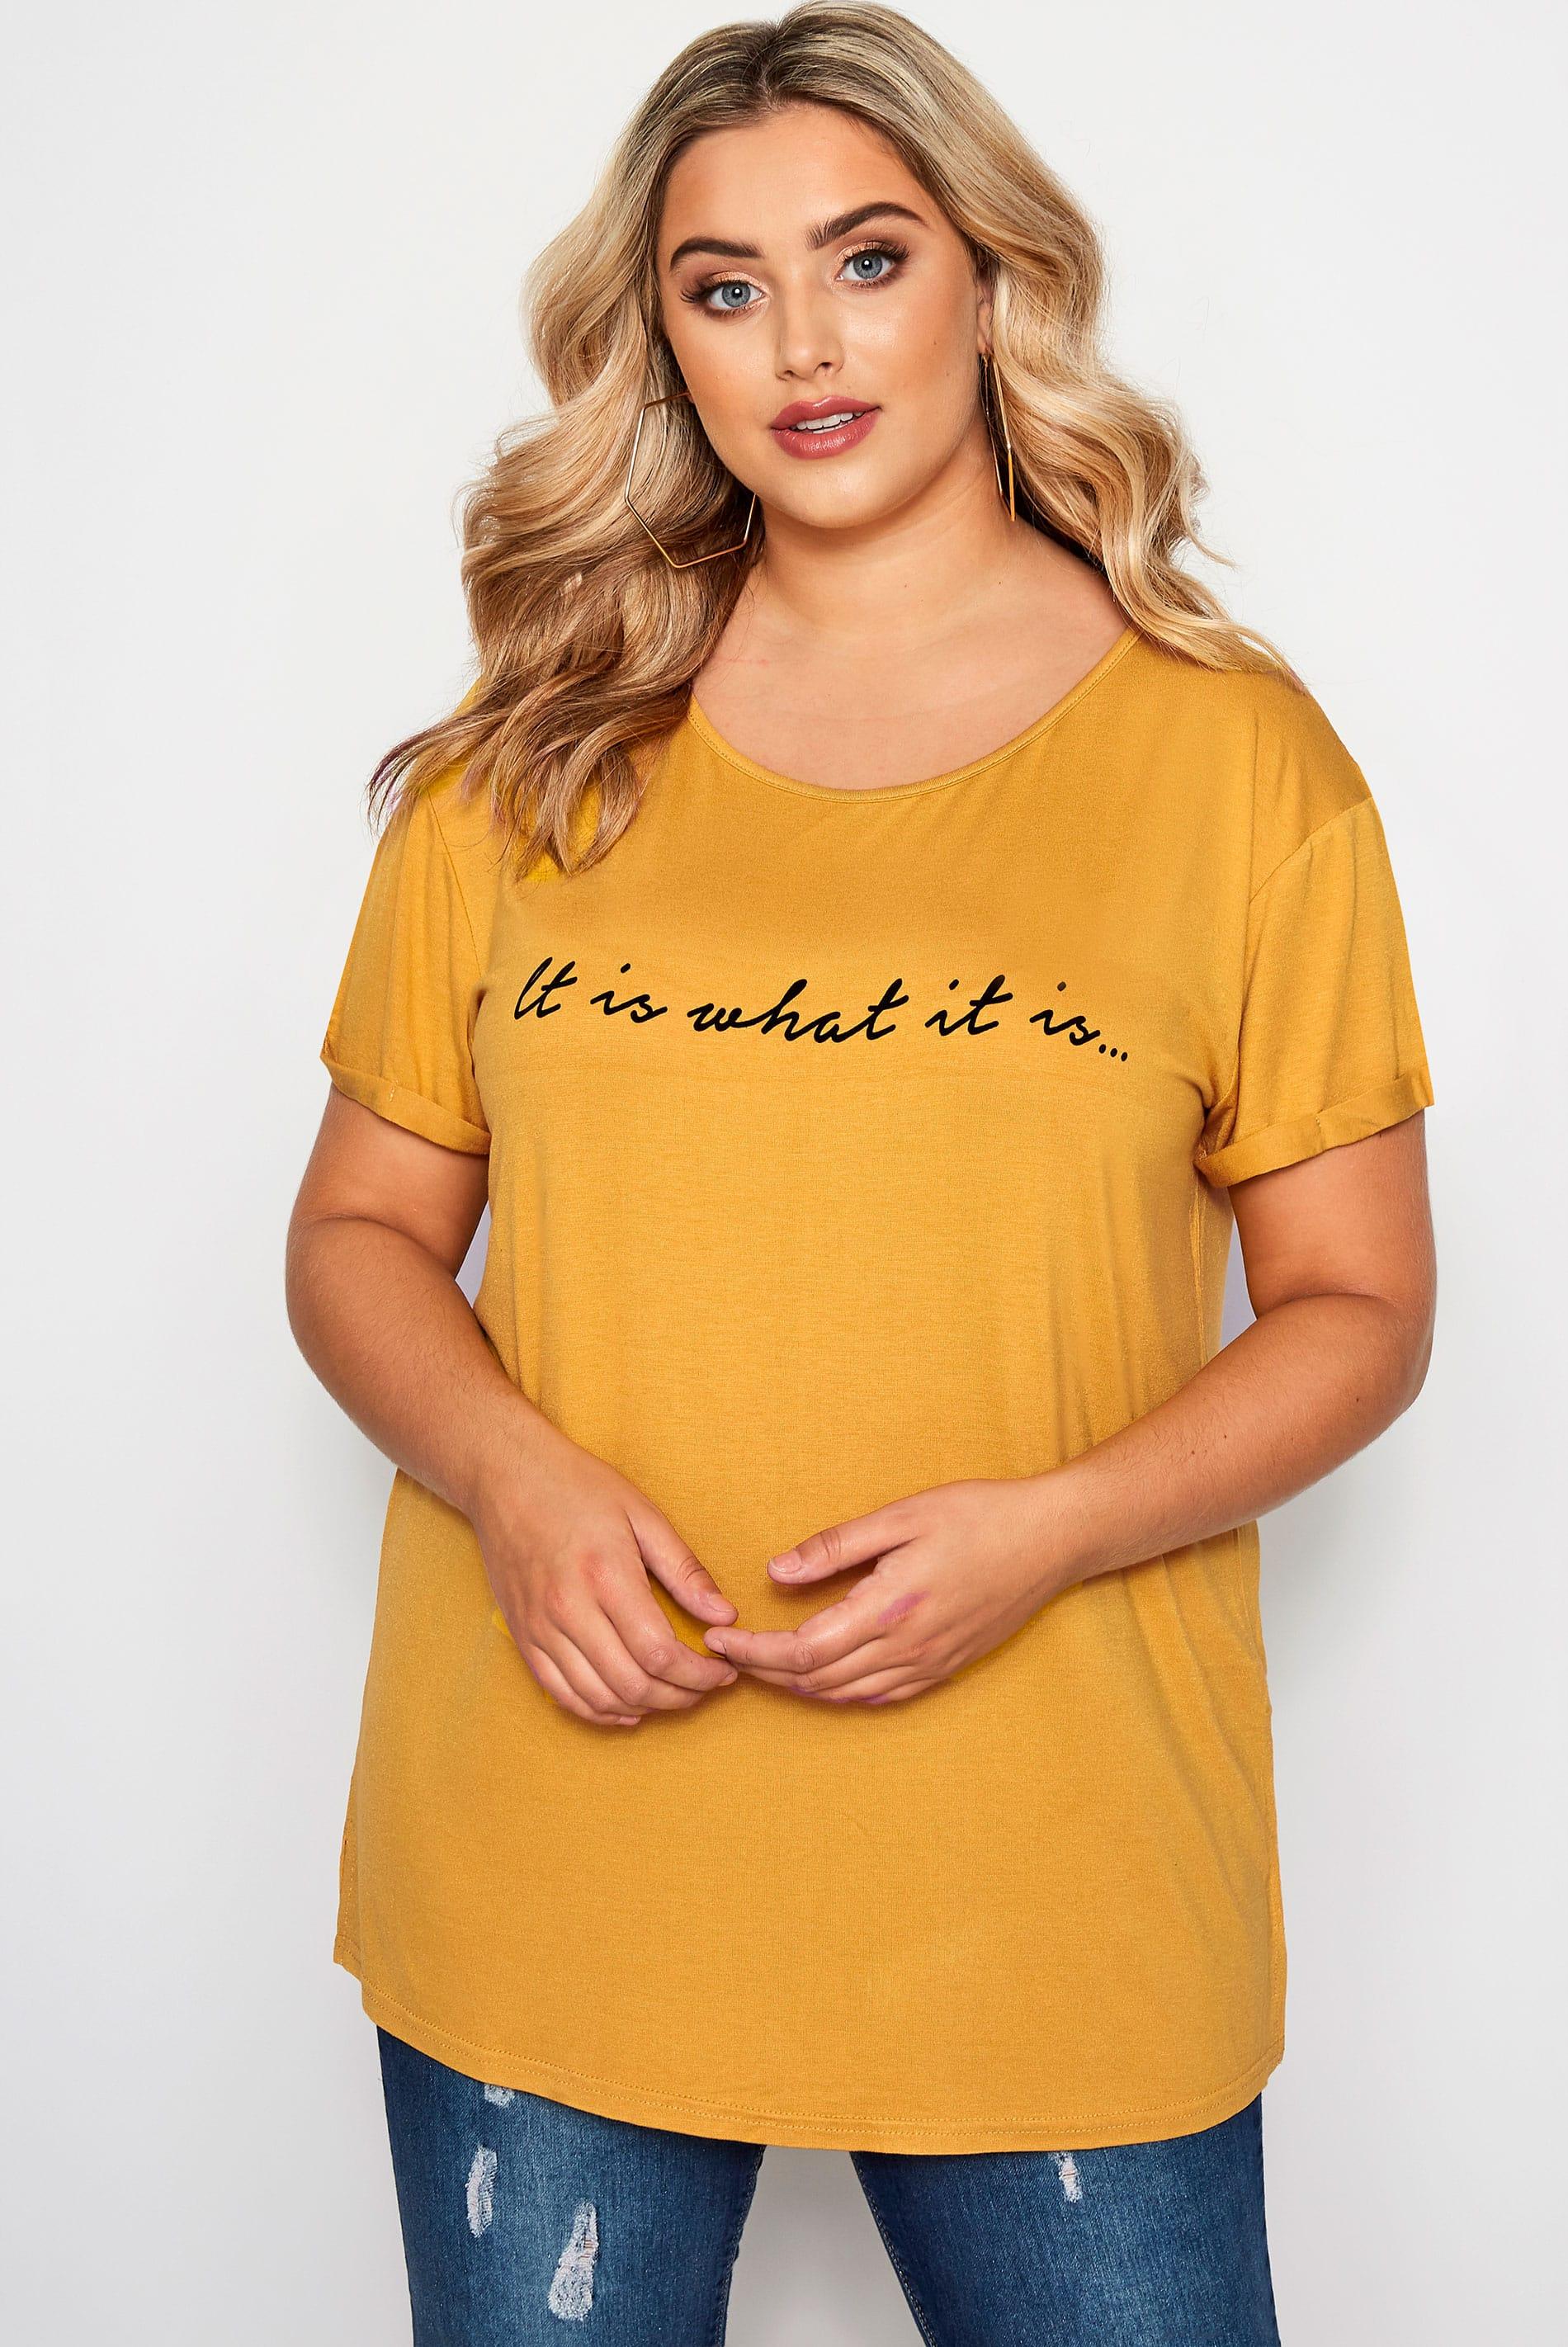 Mustard Yellow 'It Is What It Is' Slogan T-Shirt